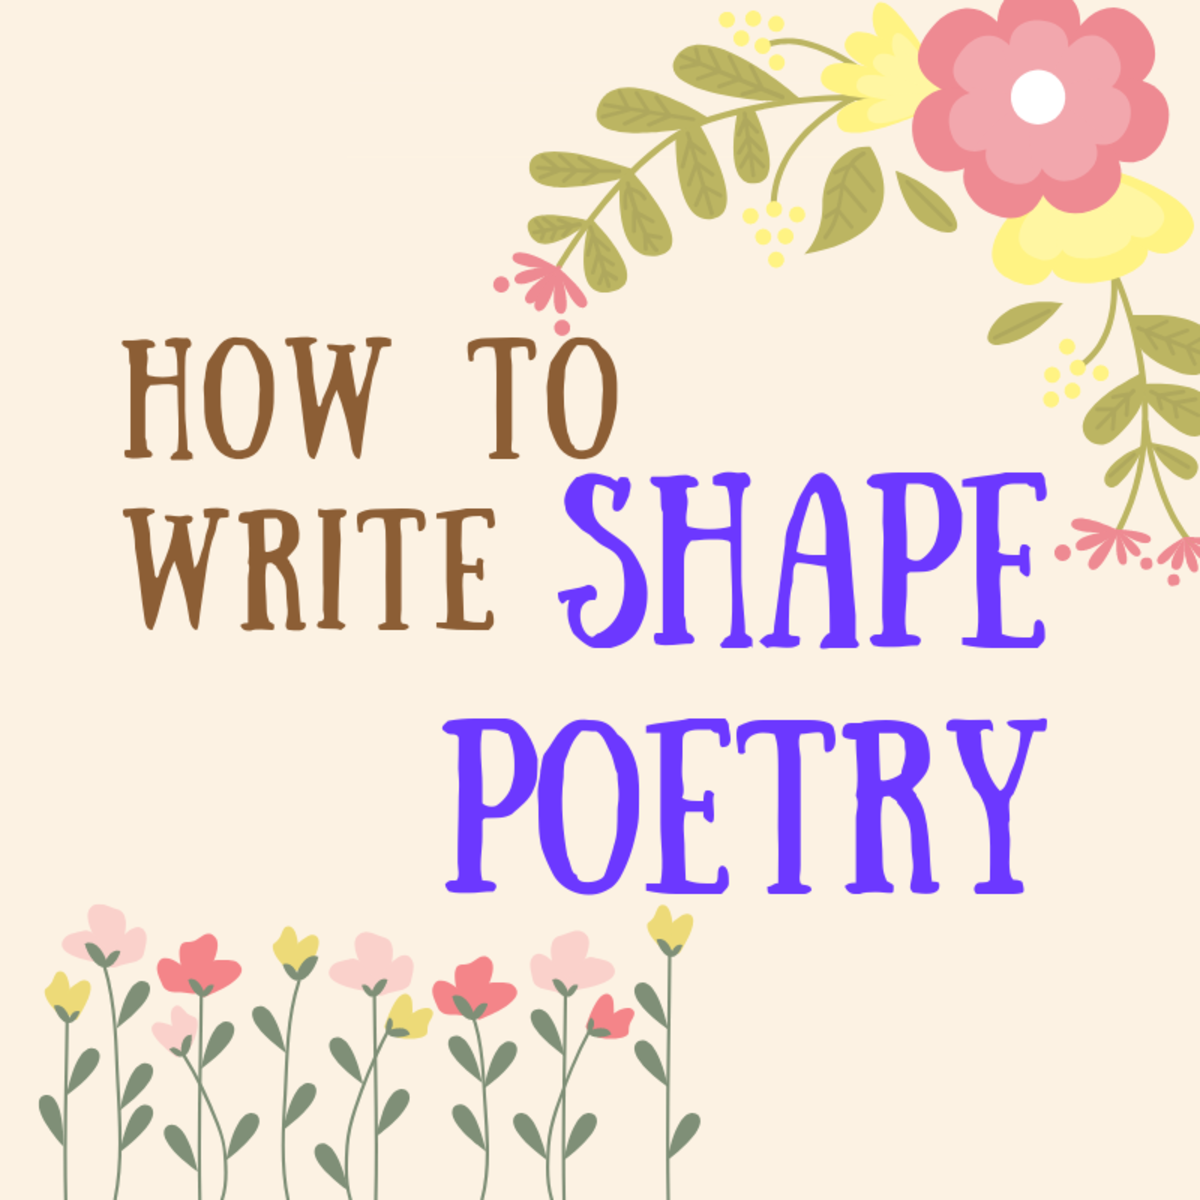 How to Write Shape Poetry